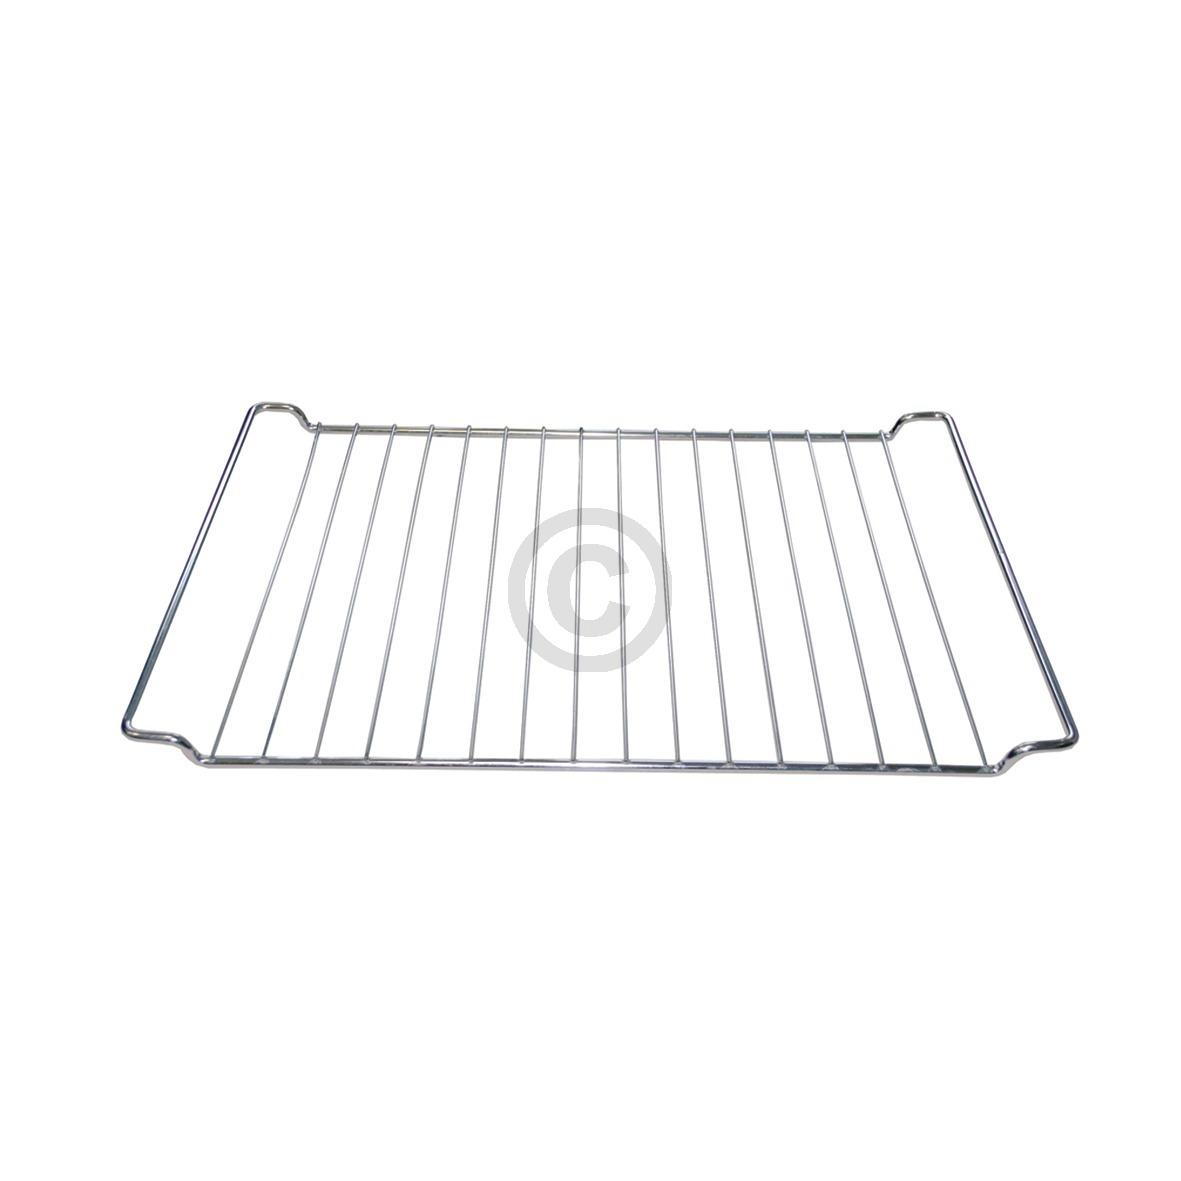 Grillrost 445x340mm, OT! 481245819334 Bauknecht, Whirlpool, Ikea